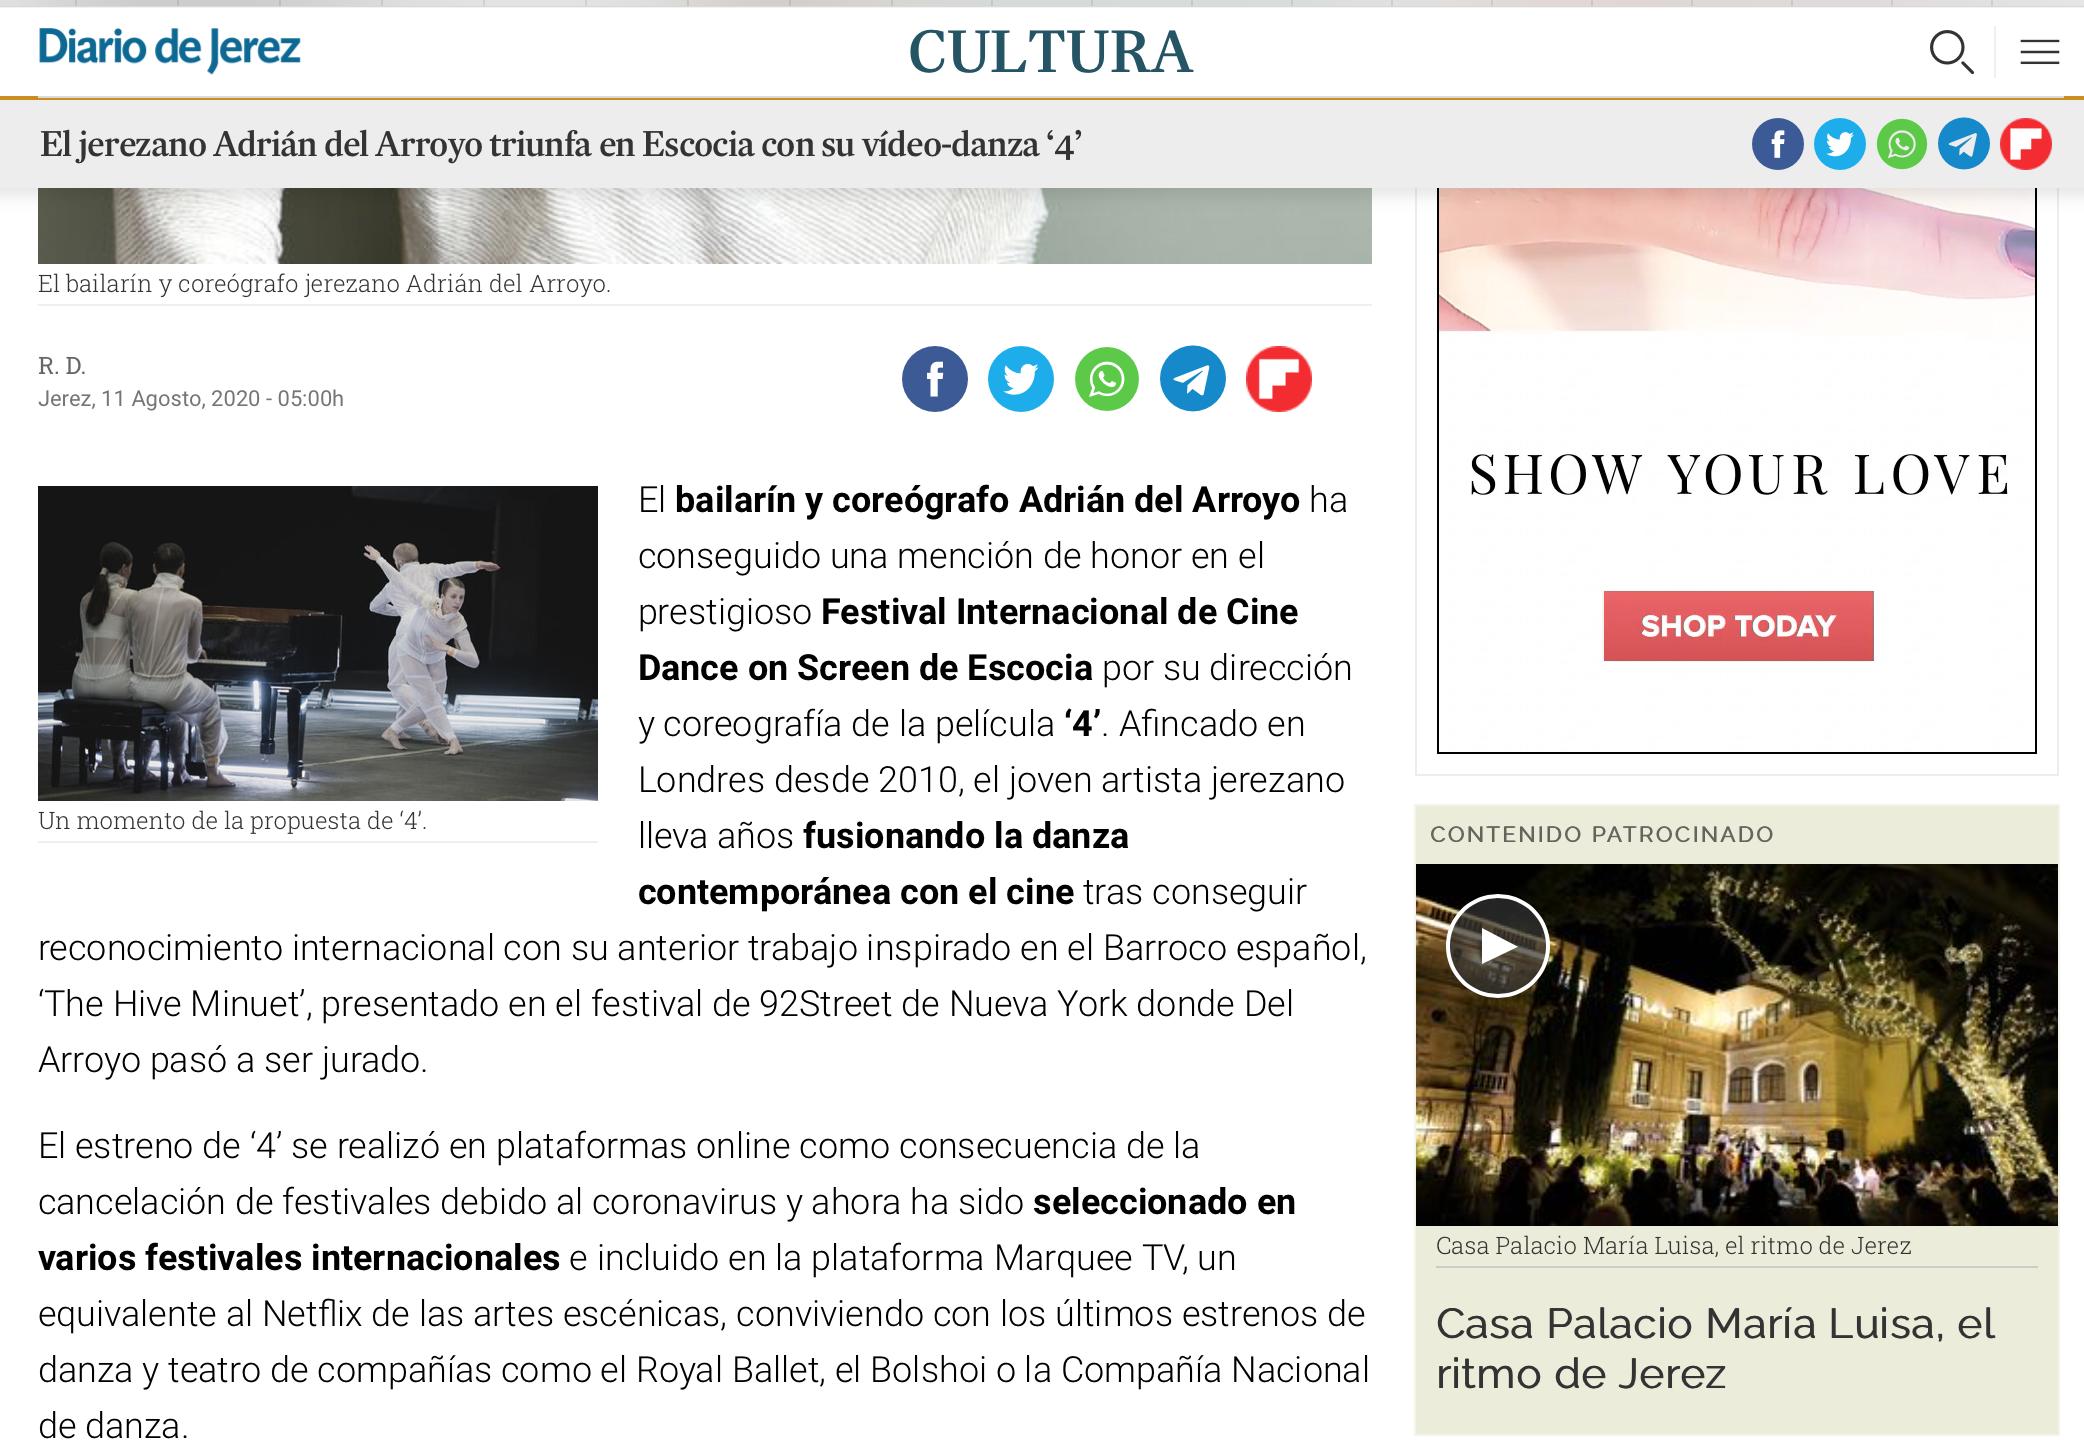 Diario de Jerez 2 Screenshot 2021-05-02 at 20.13.55